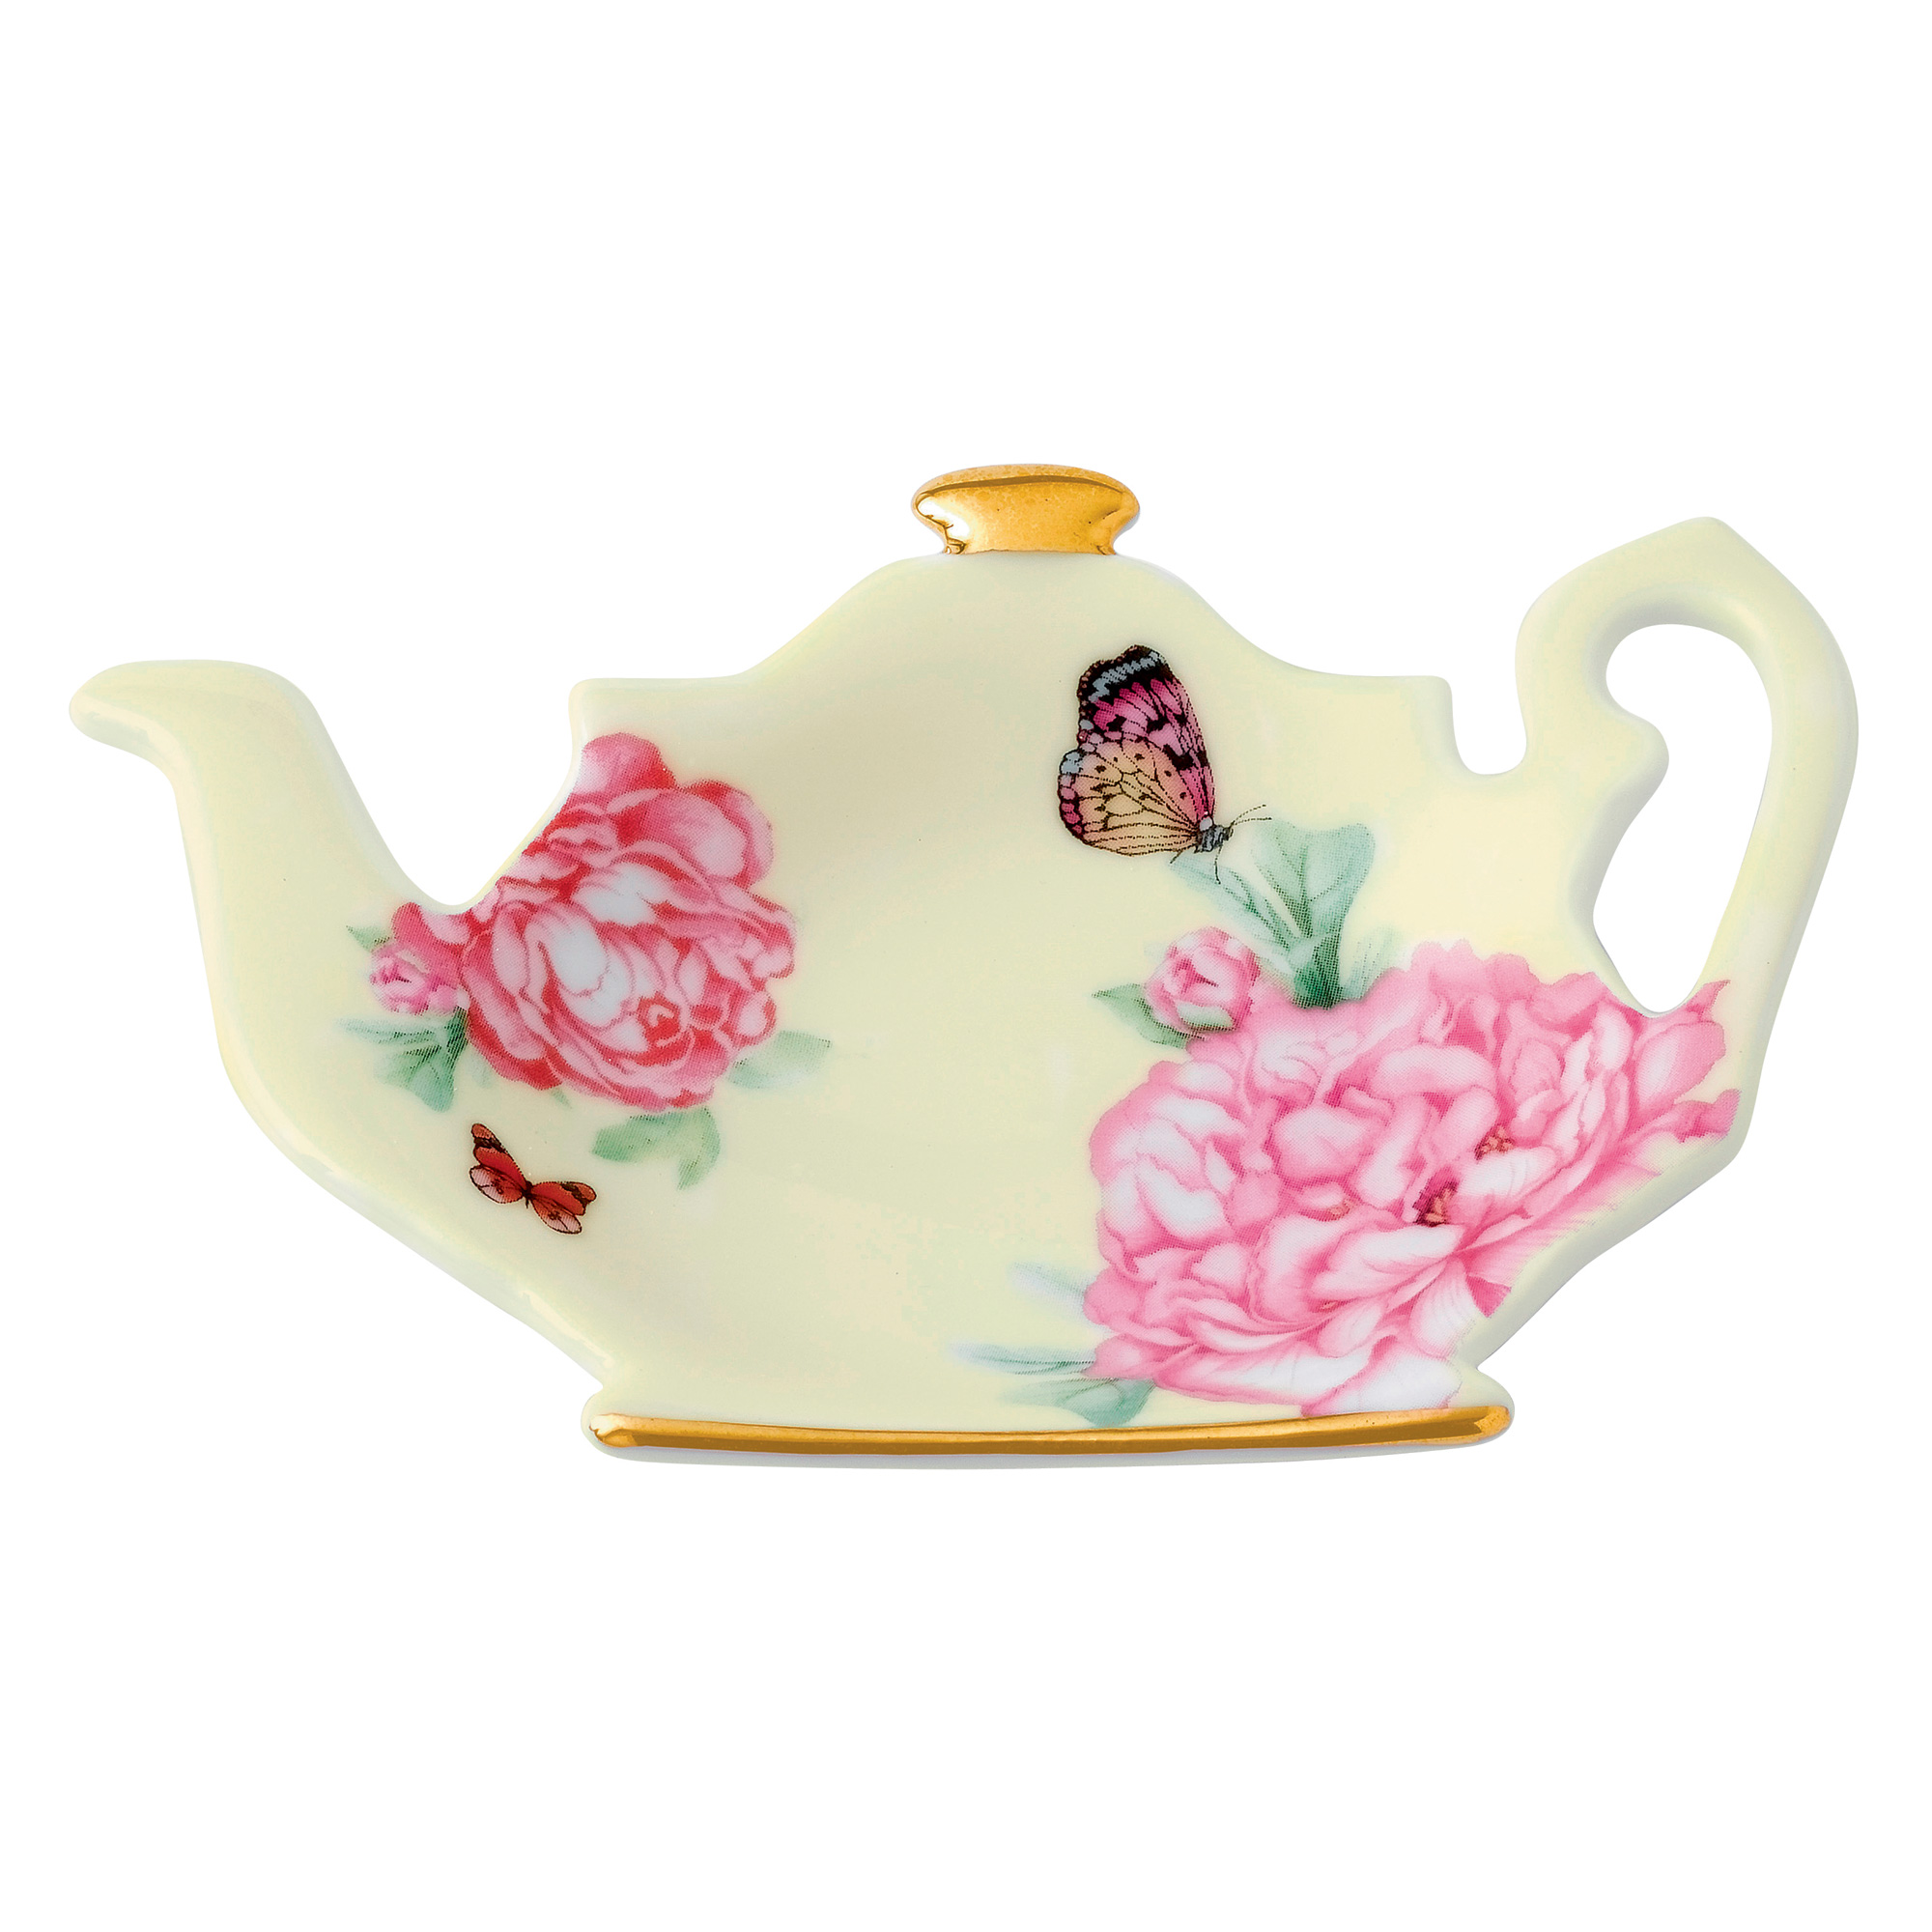 "Miranda Kerr for Royal Albert Collection - Tea Tip ""Joy"" Pattern"